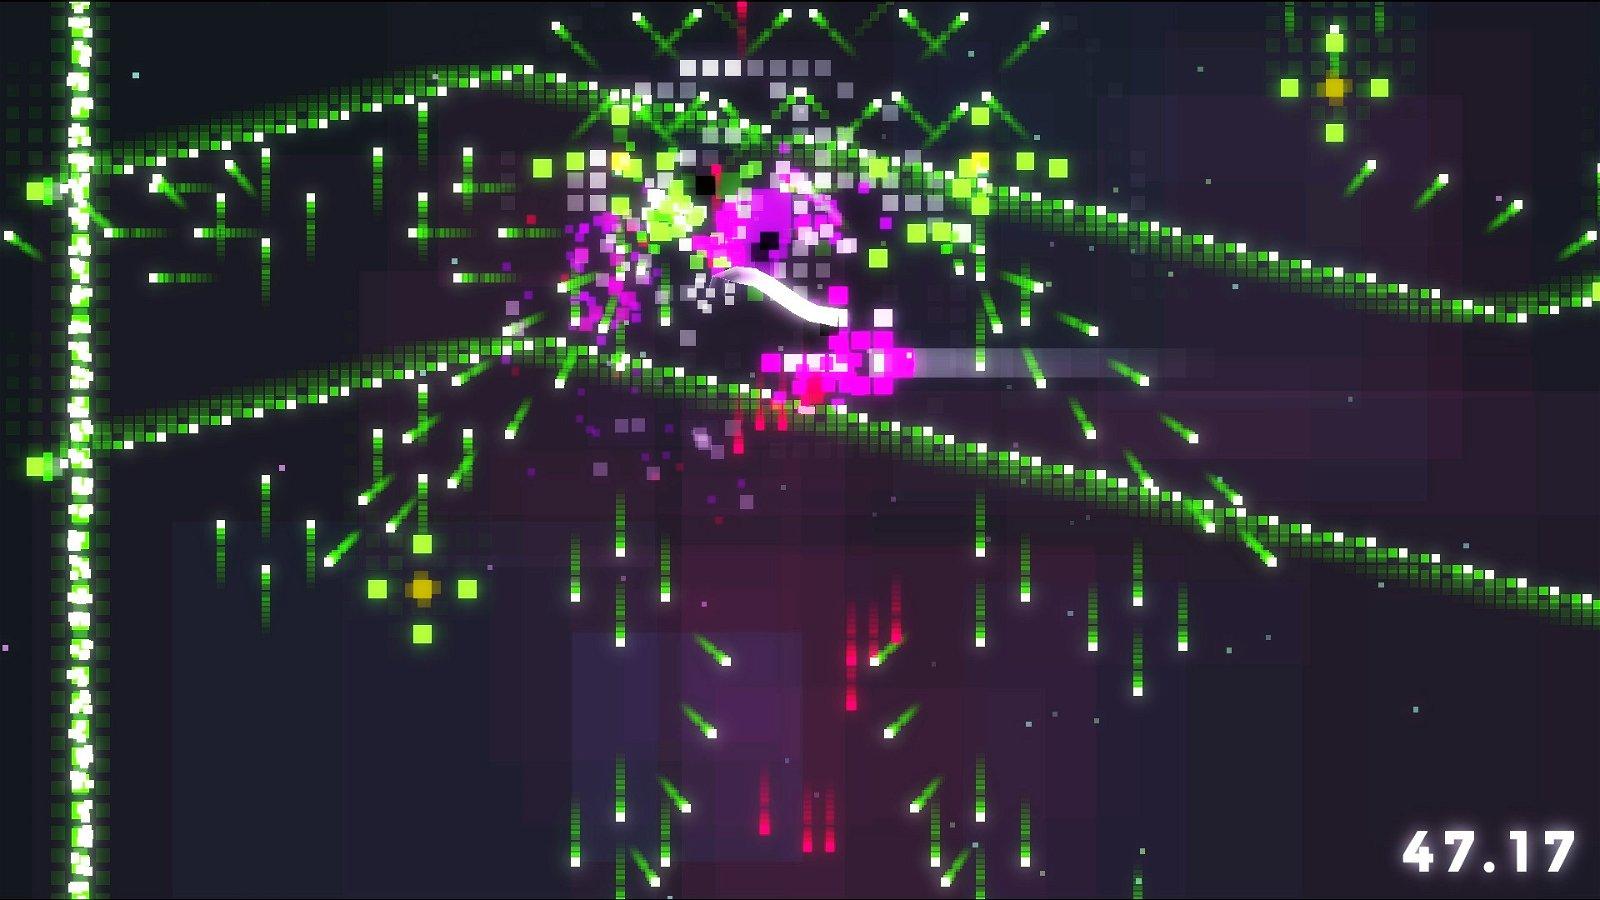 Pixelgalaxyinsert3